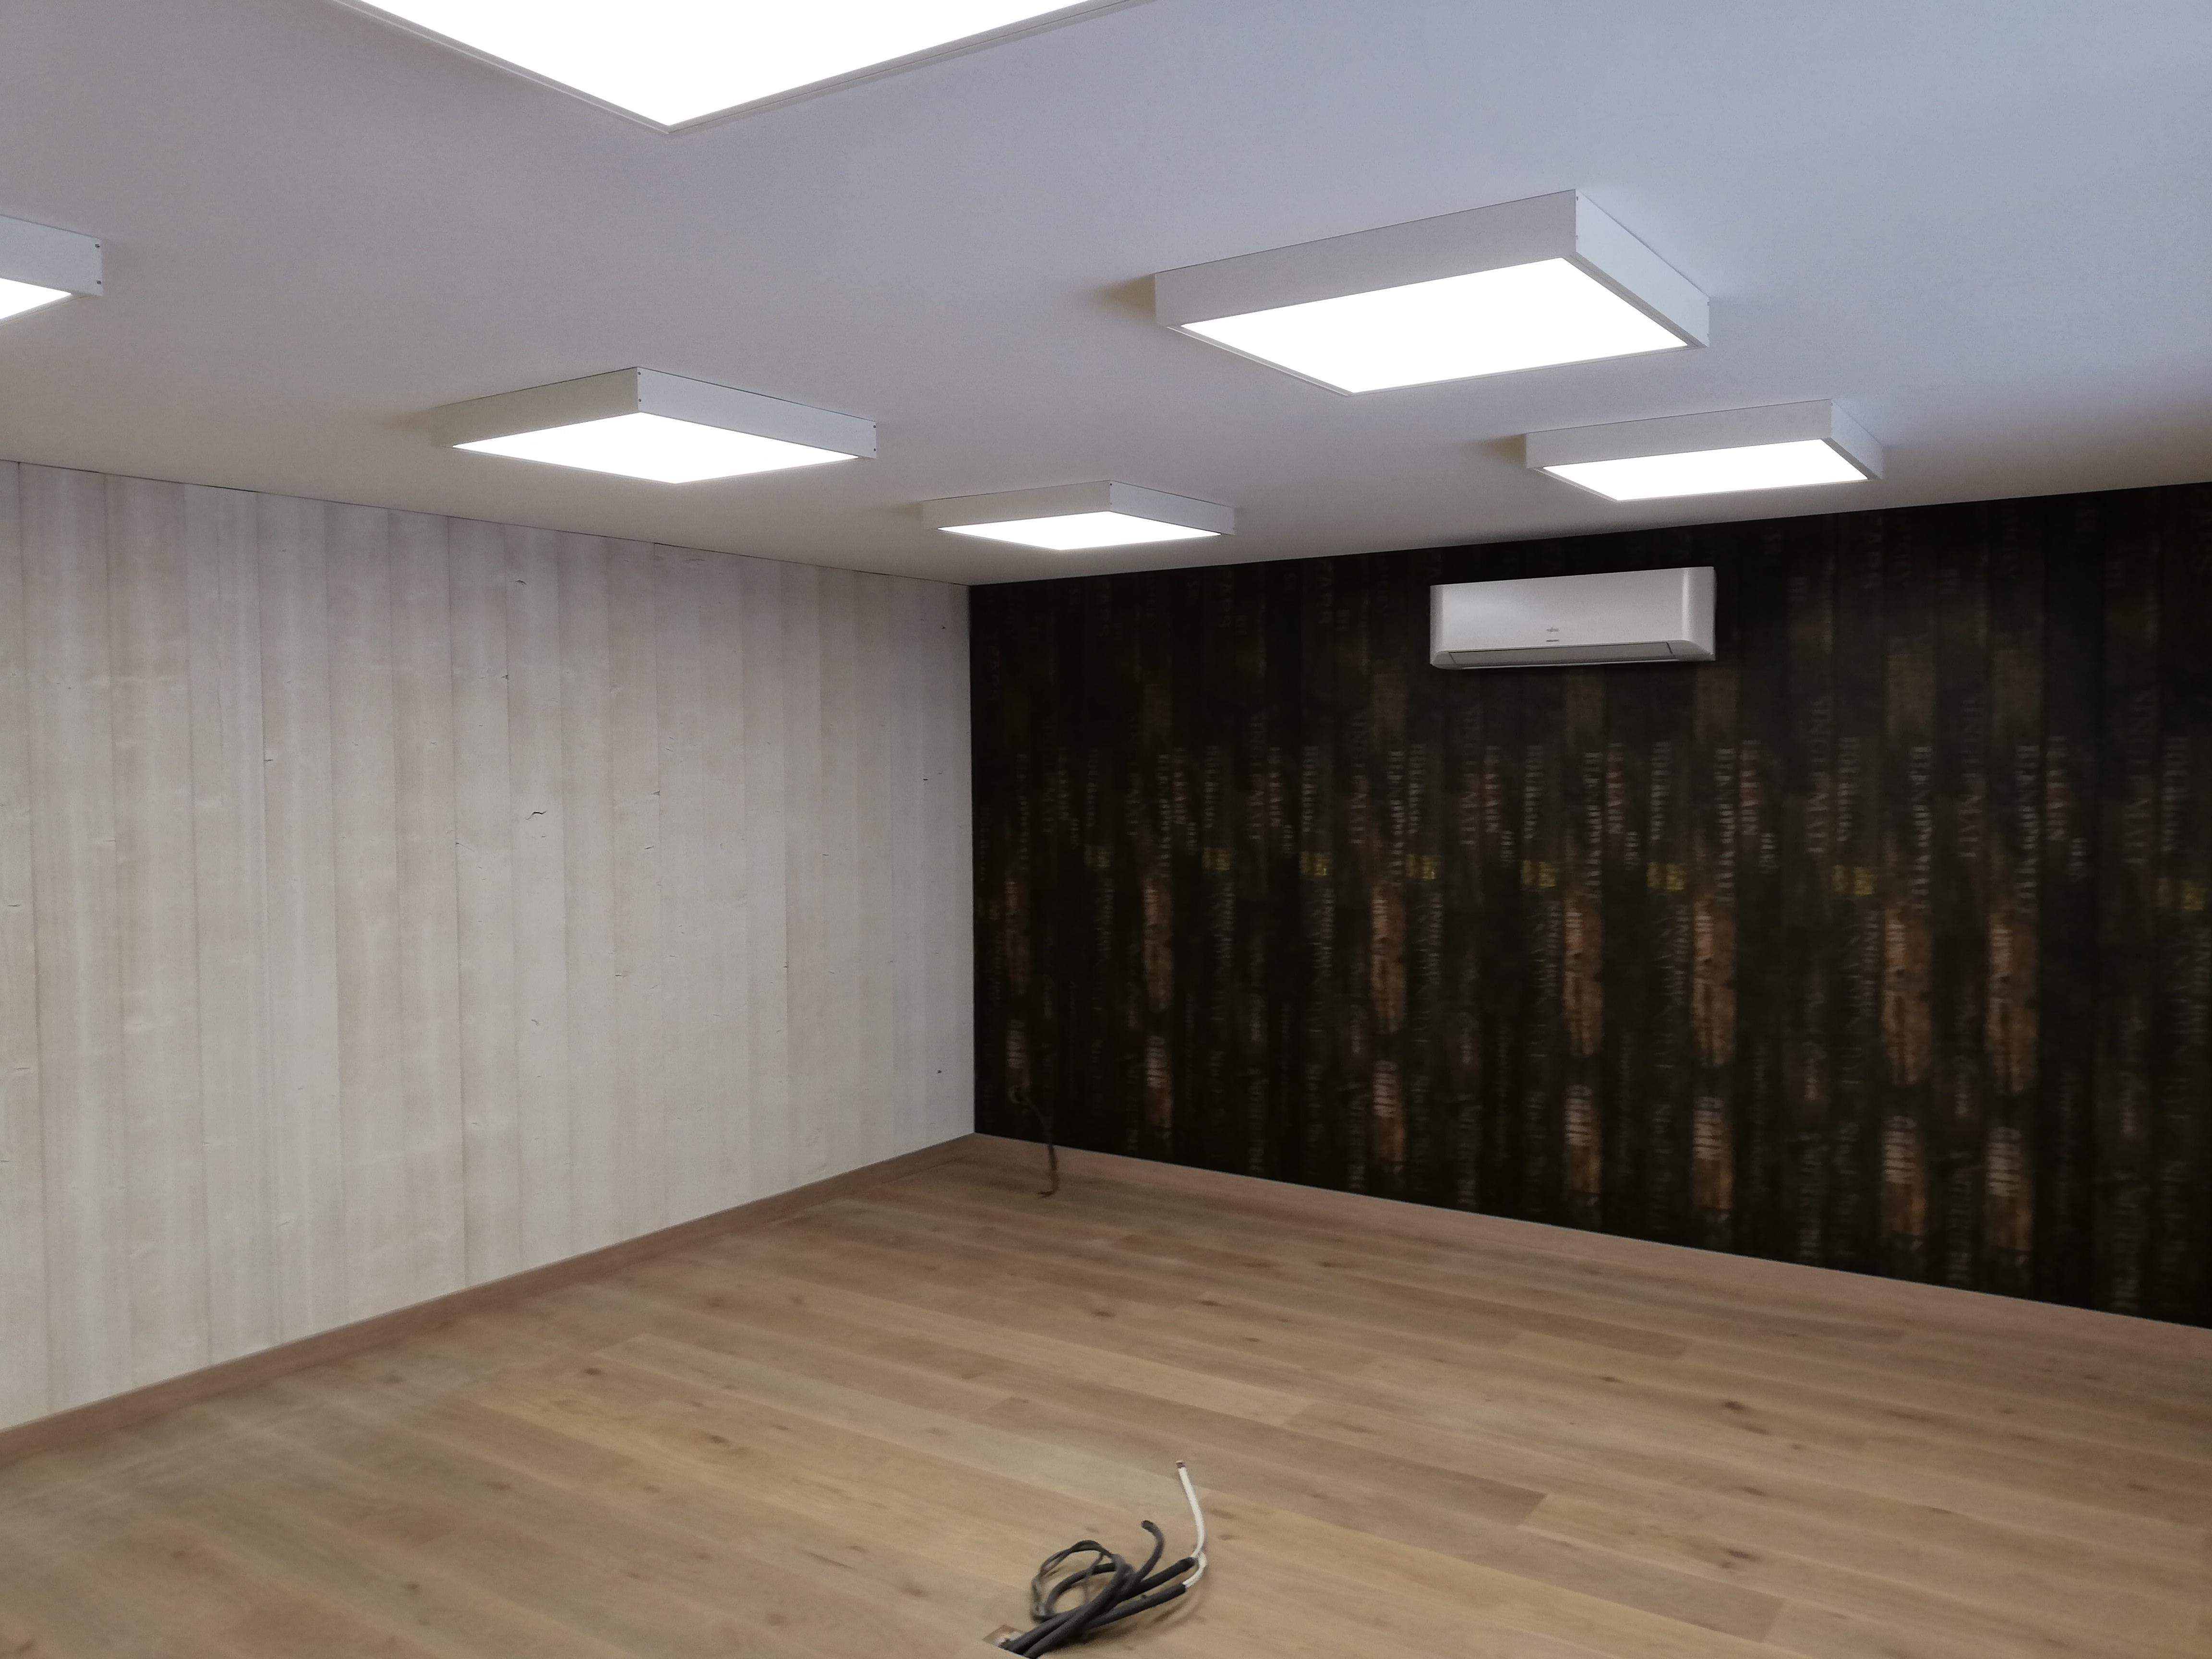 Bardage Bois Vertical Interieur habillage bardage bois - boiseco construction - maisons a